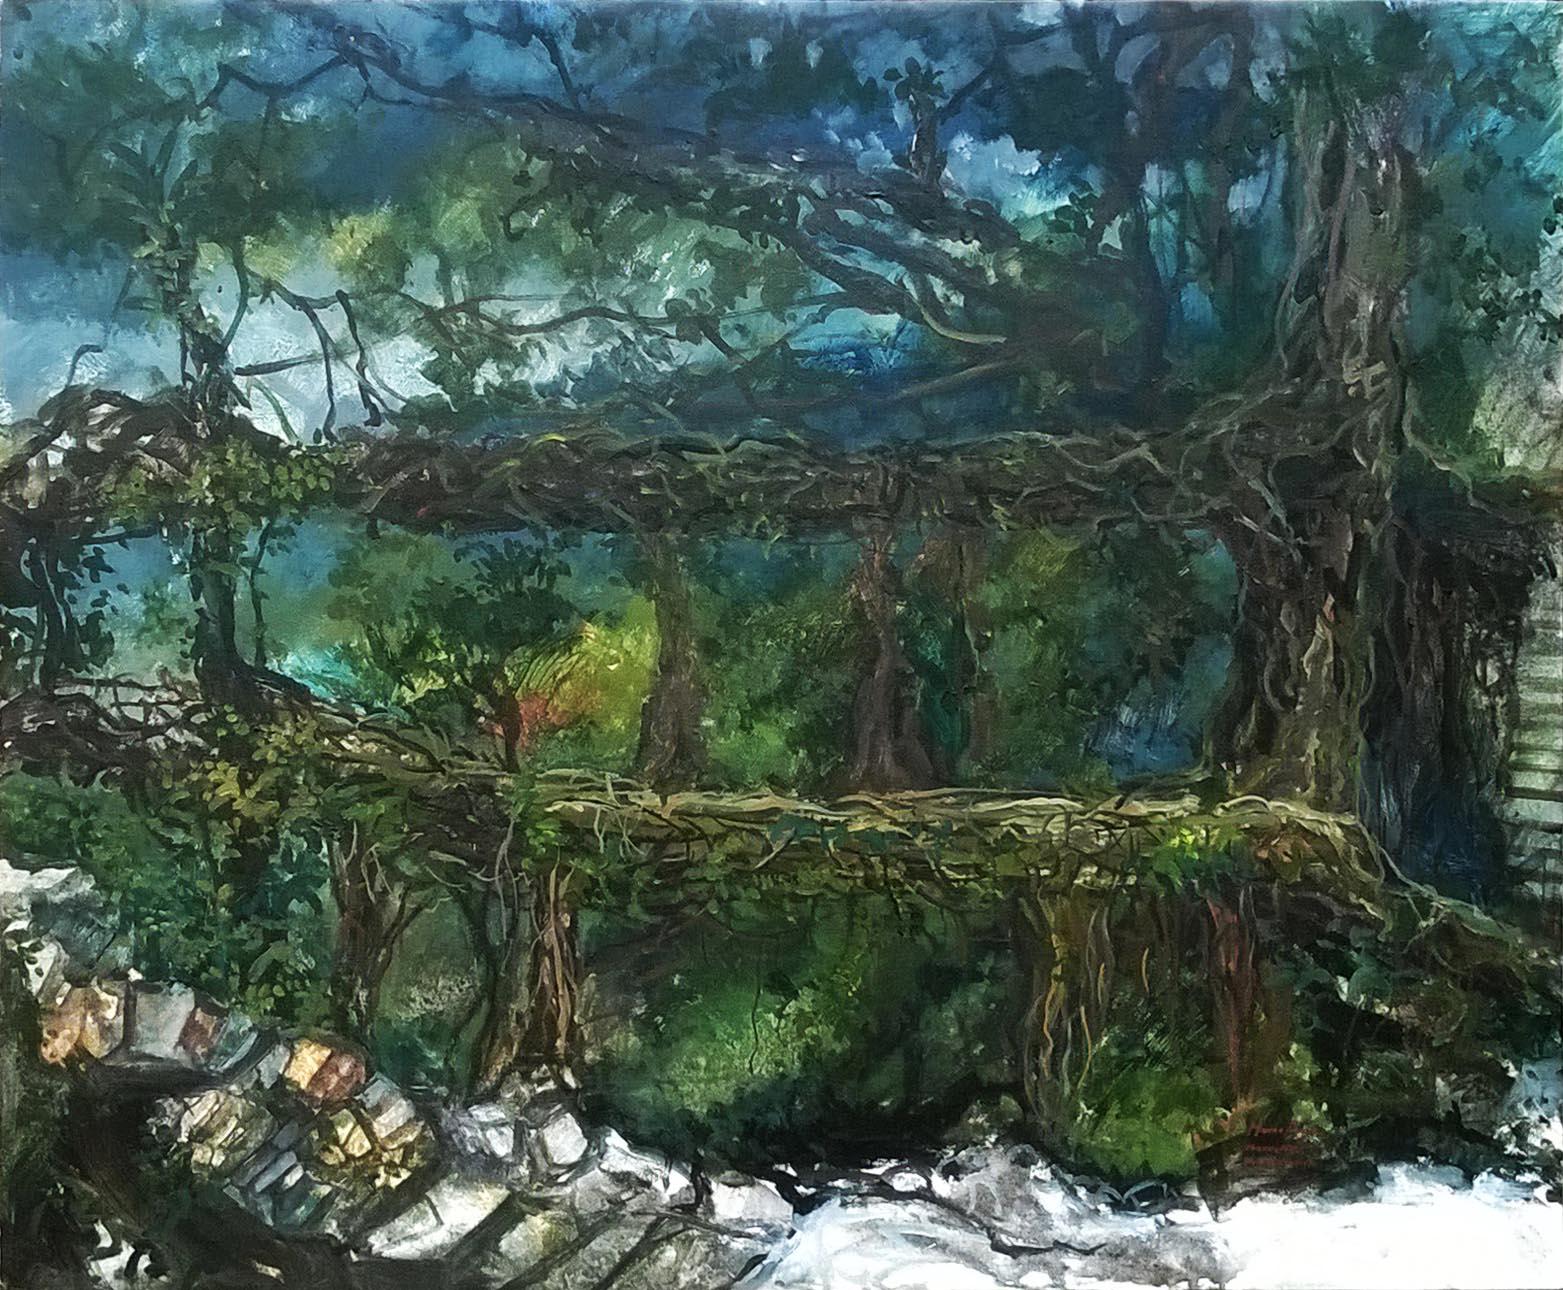 Moinuddin Moni, Root Bridge, Acrylic on canvas,100 x 75 cm, 2017